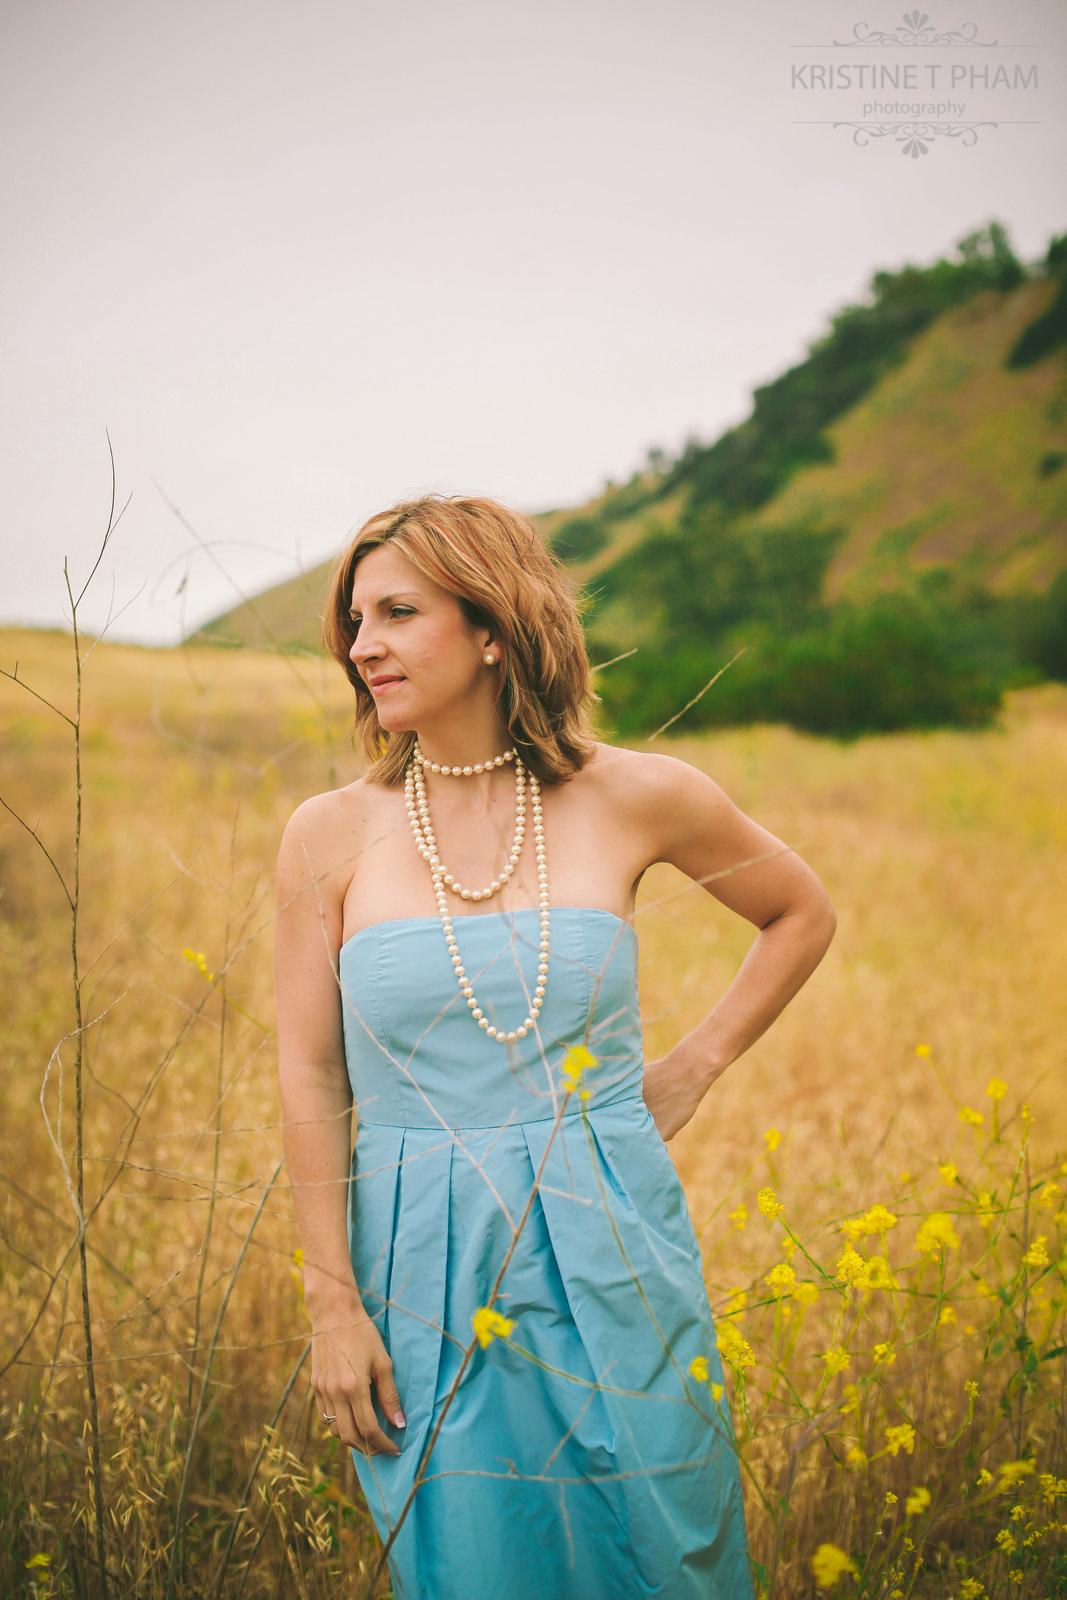 Kristine T Pham Photography